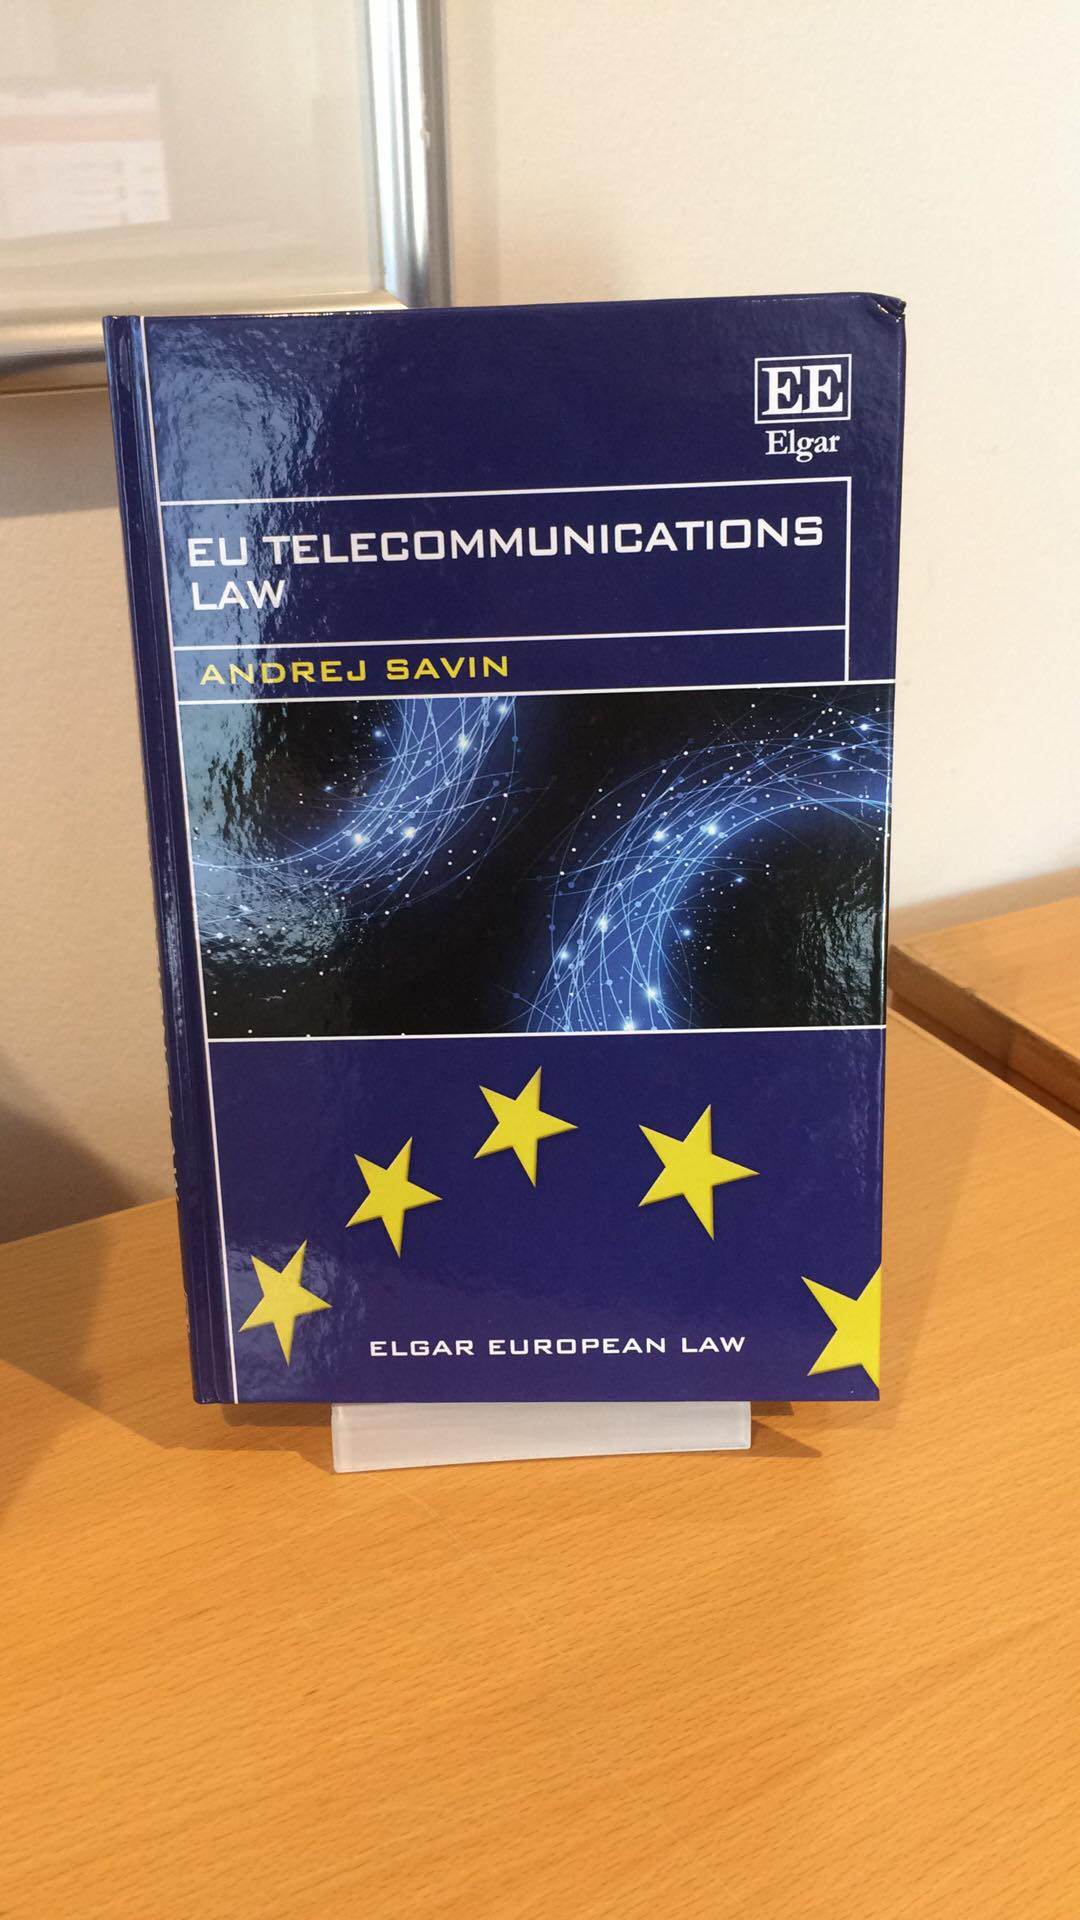 EU telecommunication law